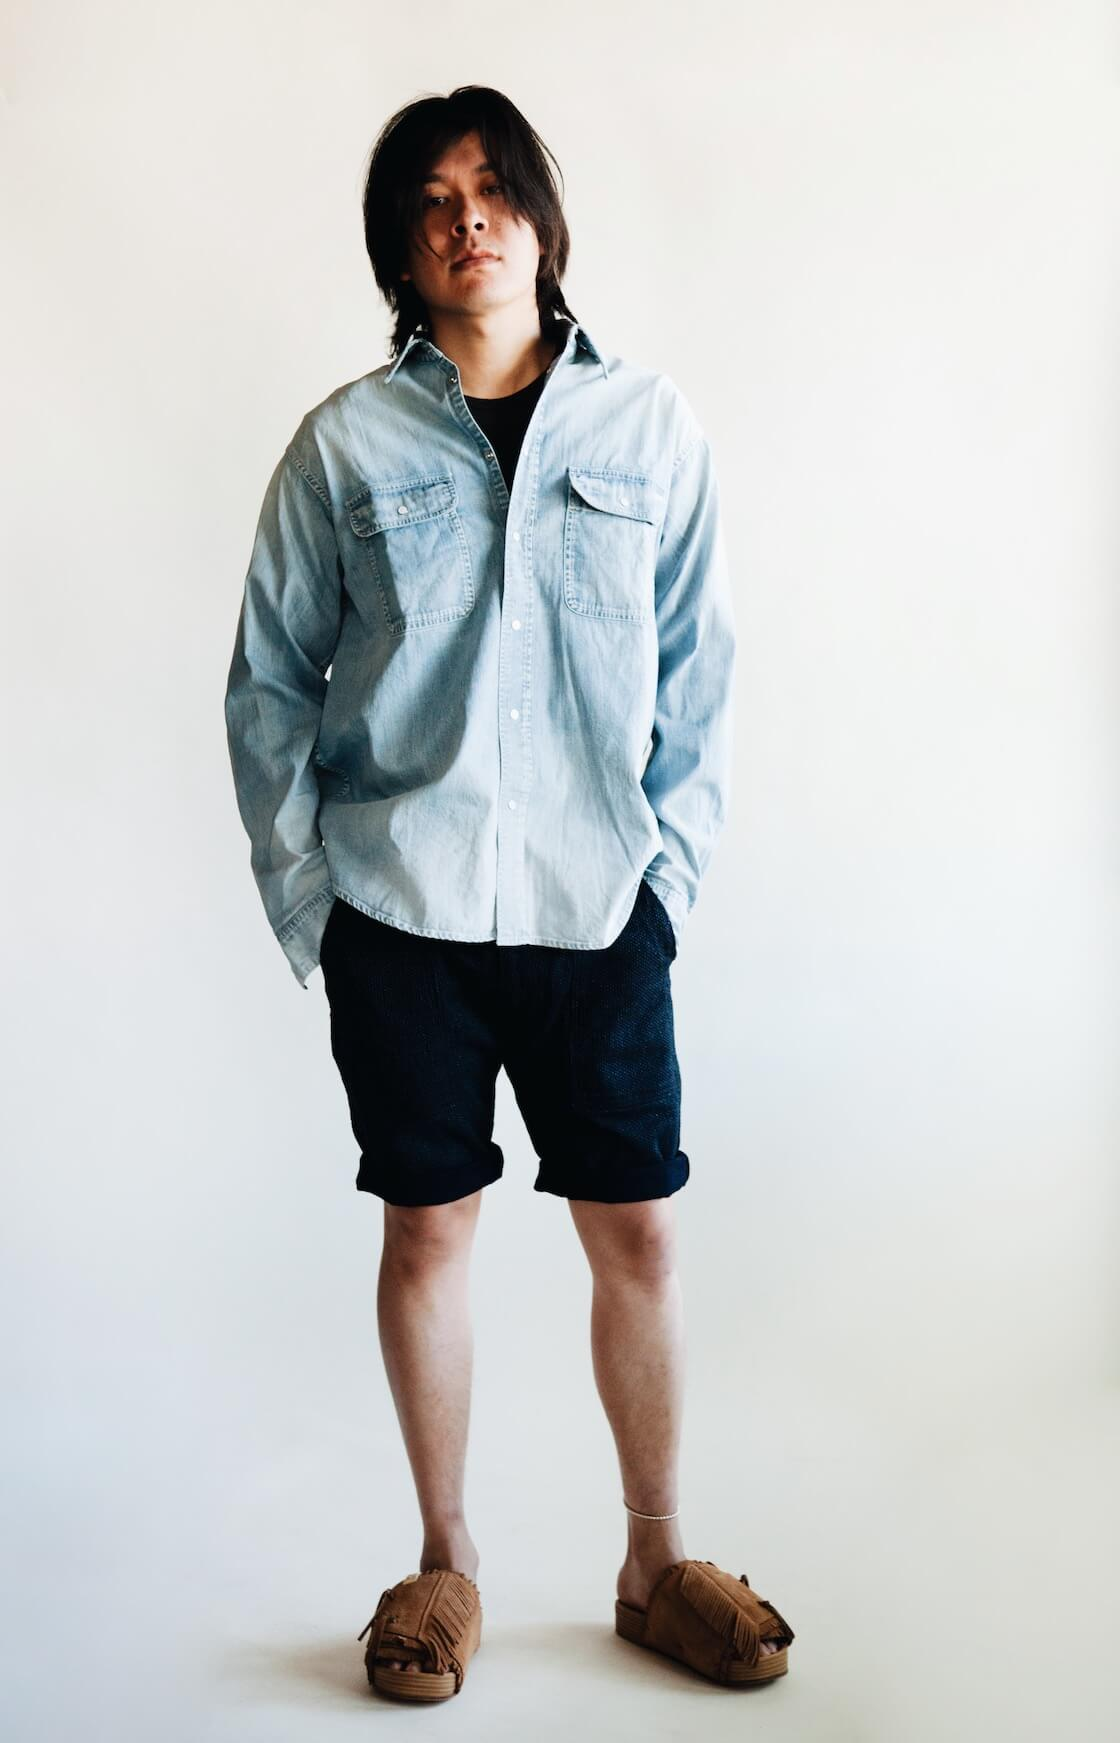 visvim ss handyman shirt, knickerbocker tube knit tee, pure blue japan selvedge sashiko denim utility shorts and visvim christo sandals on body